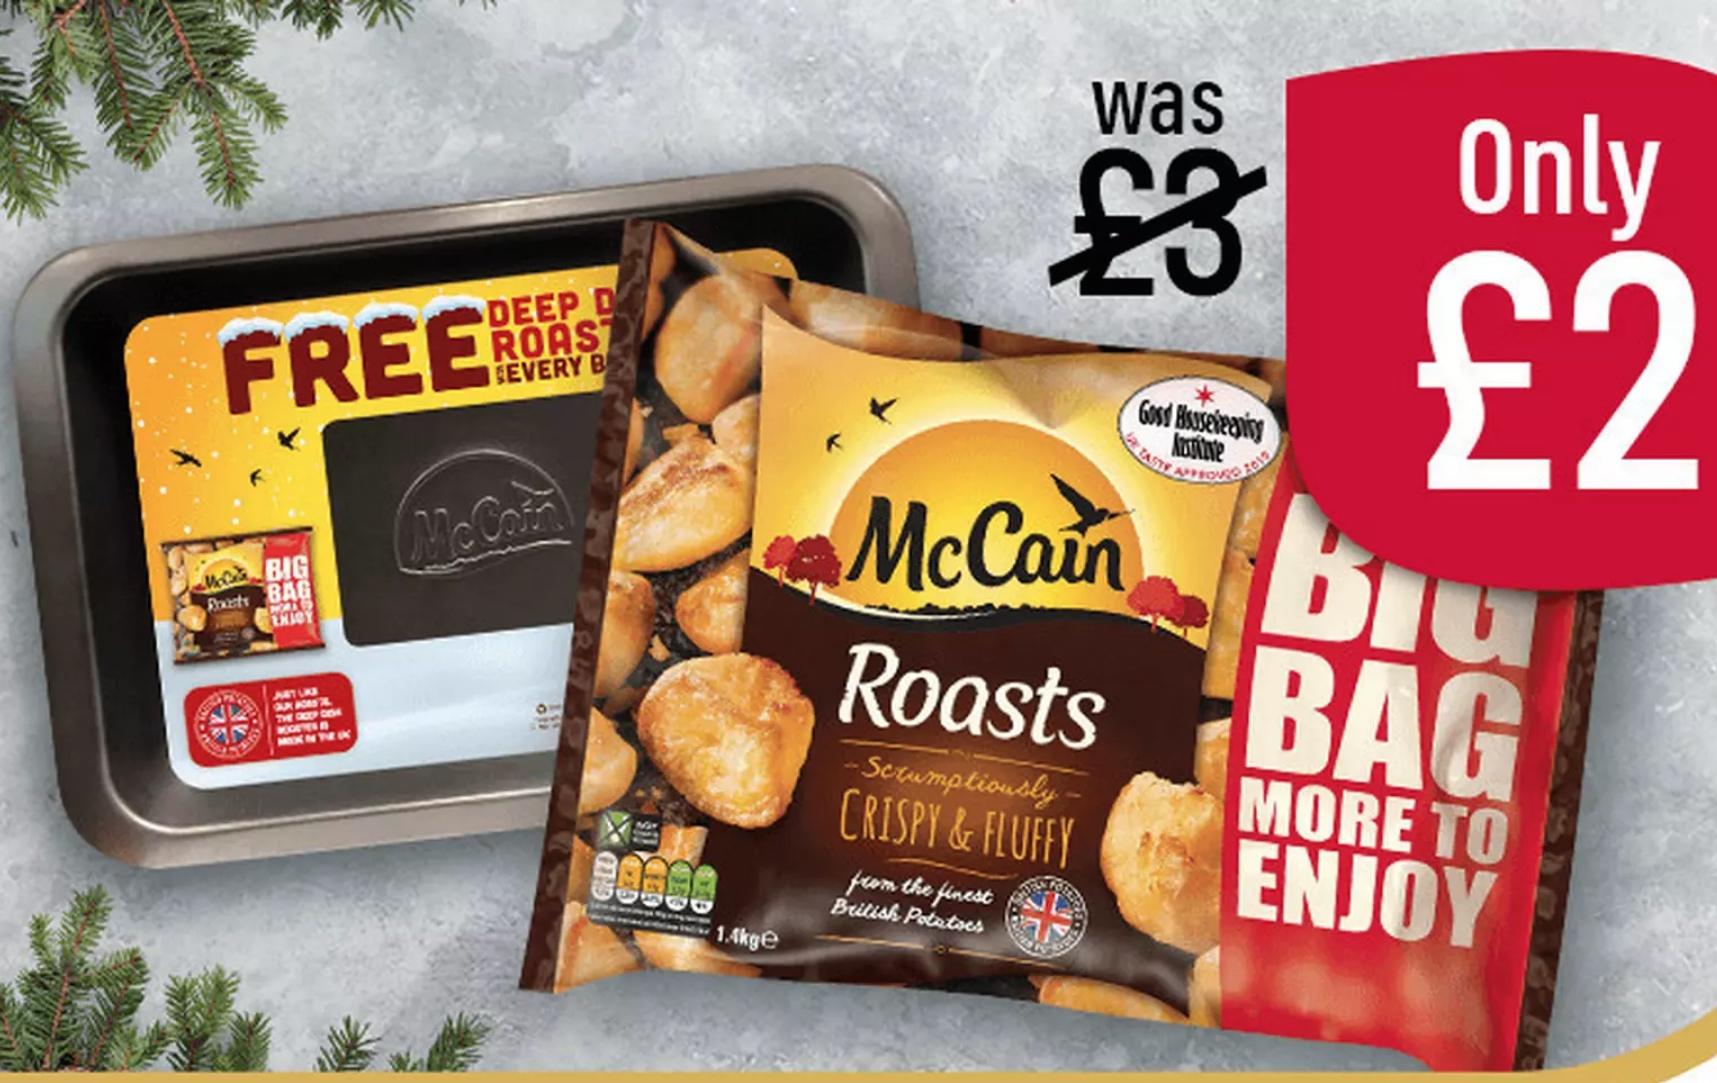 McCain Frozen Roast Potatoes 1.4kg + Free McCain Roasting Tray + Free SIM cards = £2 @ Iceland